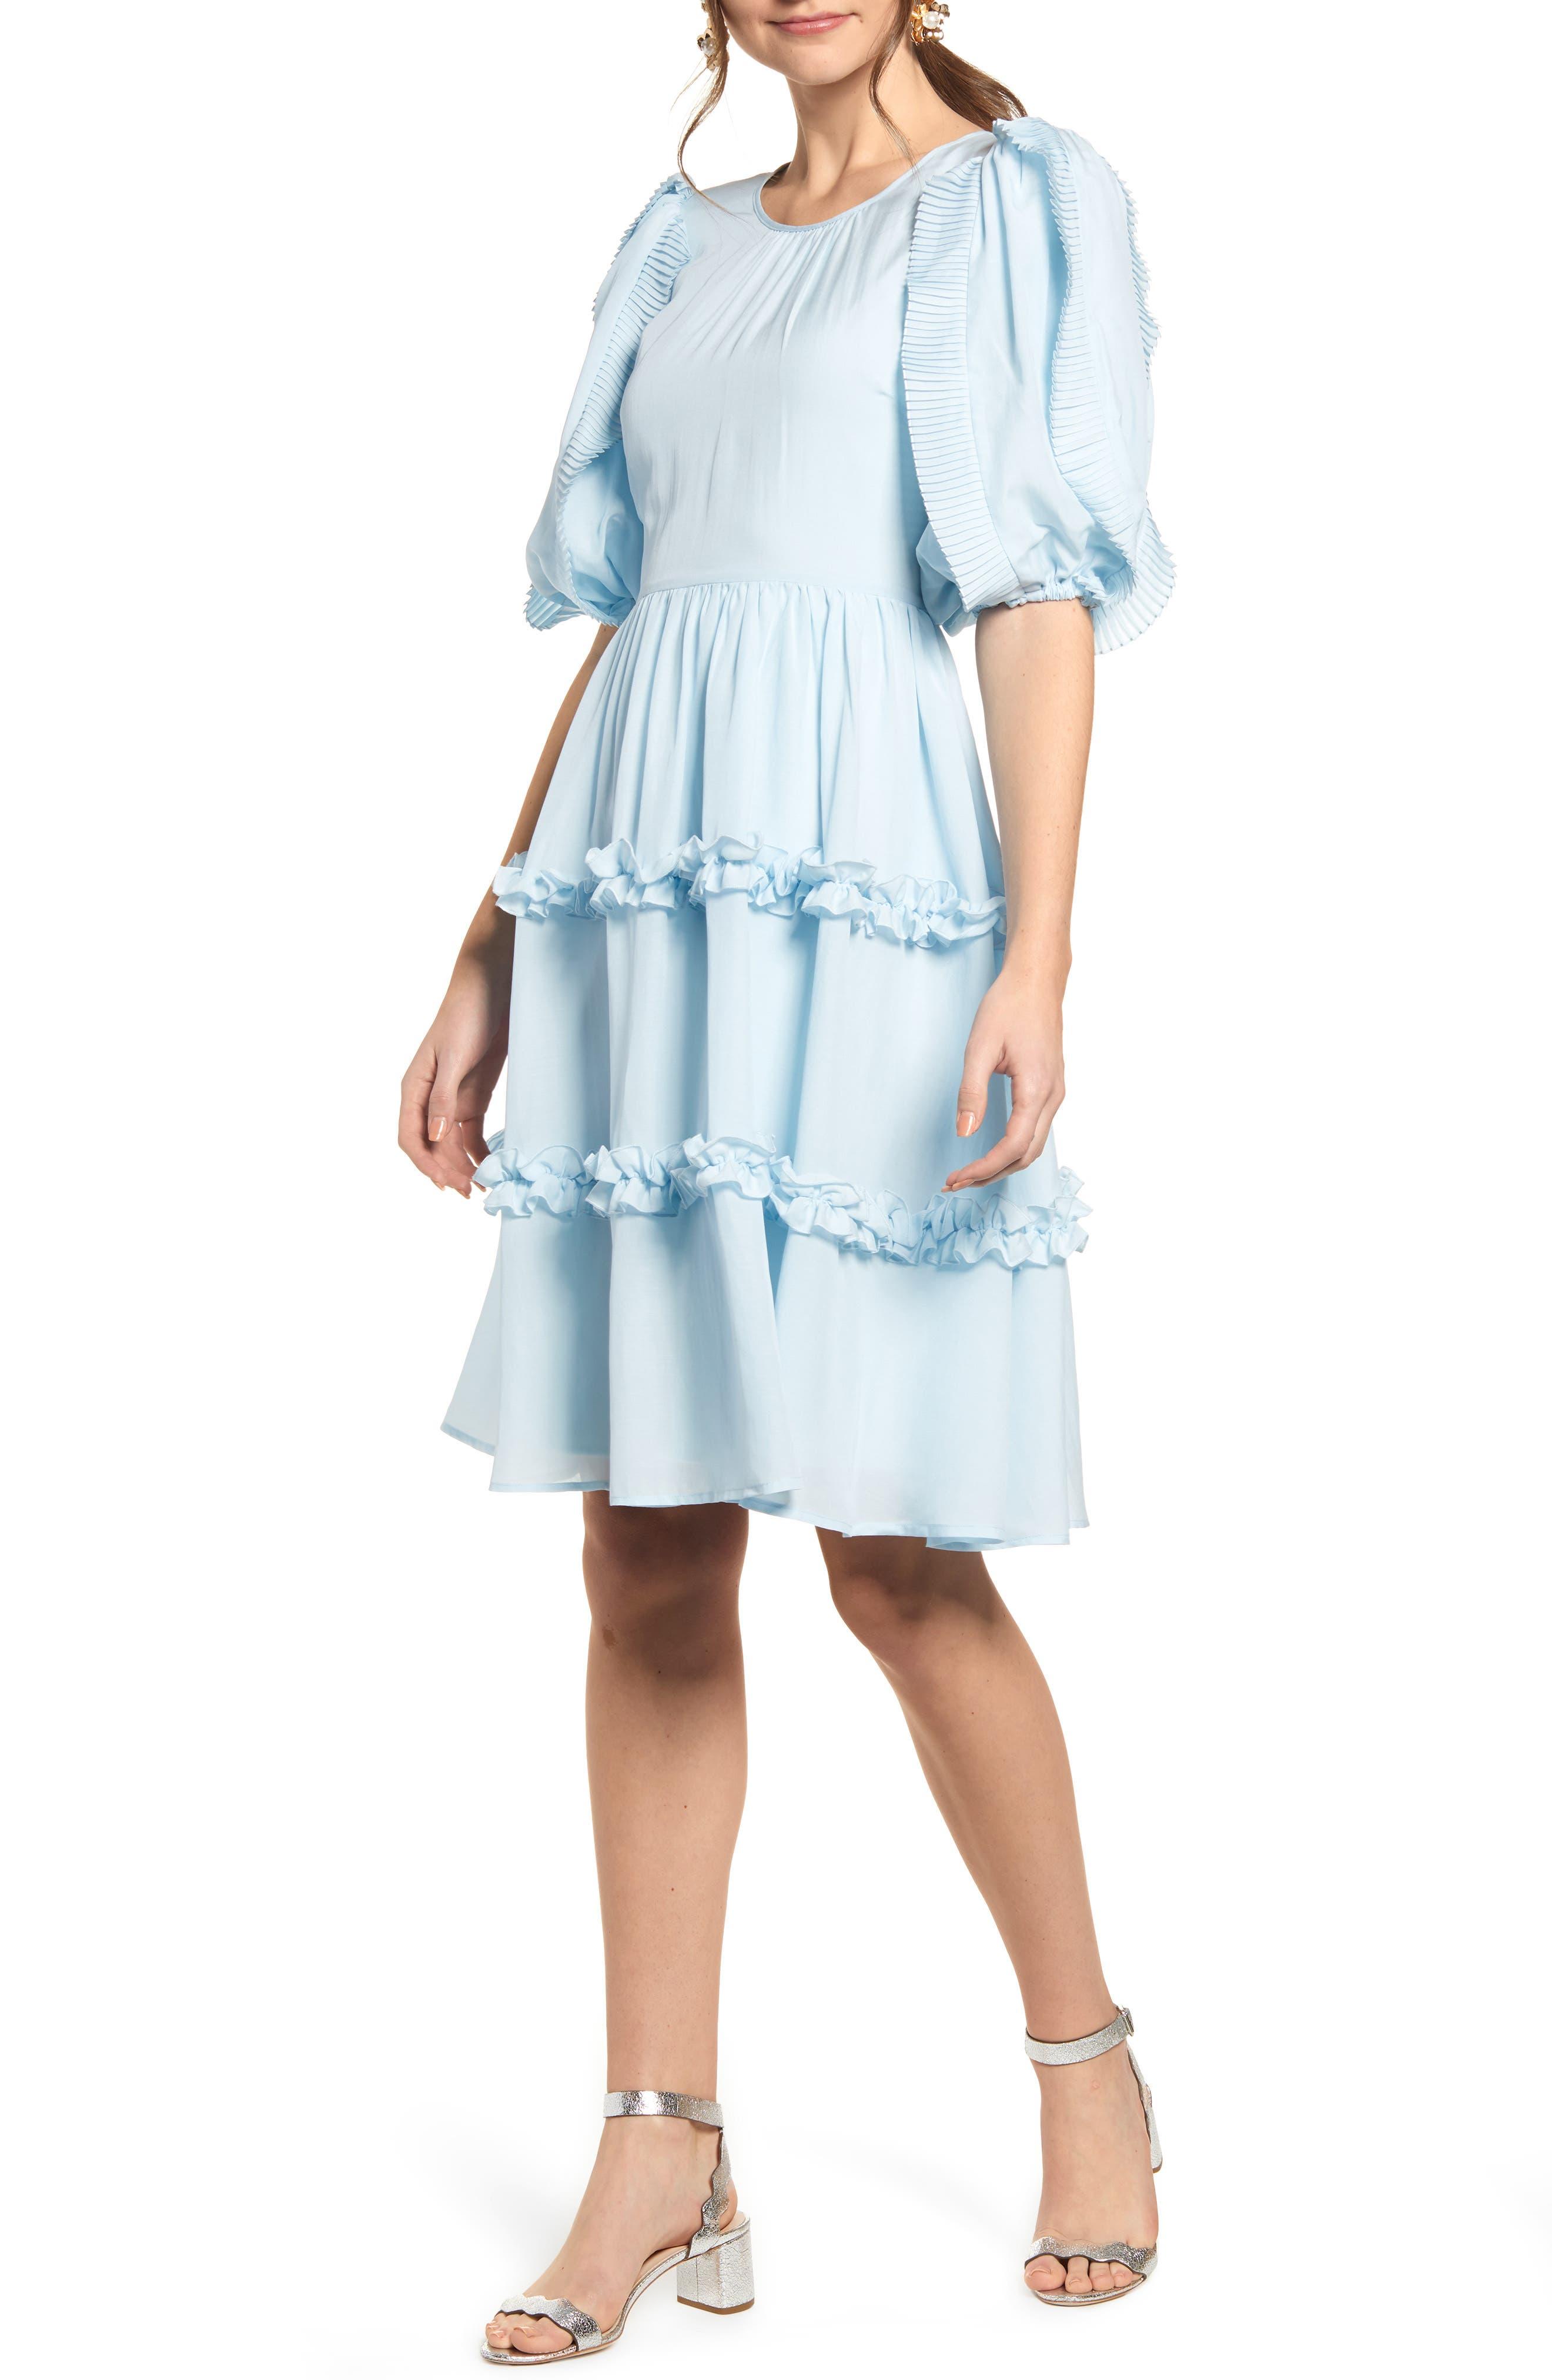 RACHEL PARCELL Ruffle Sleeve Dress, Main, color, BLUE WINTER